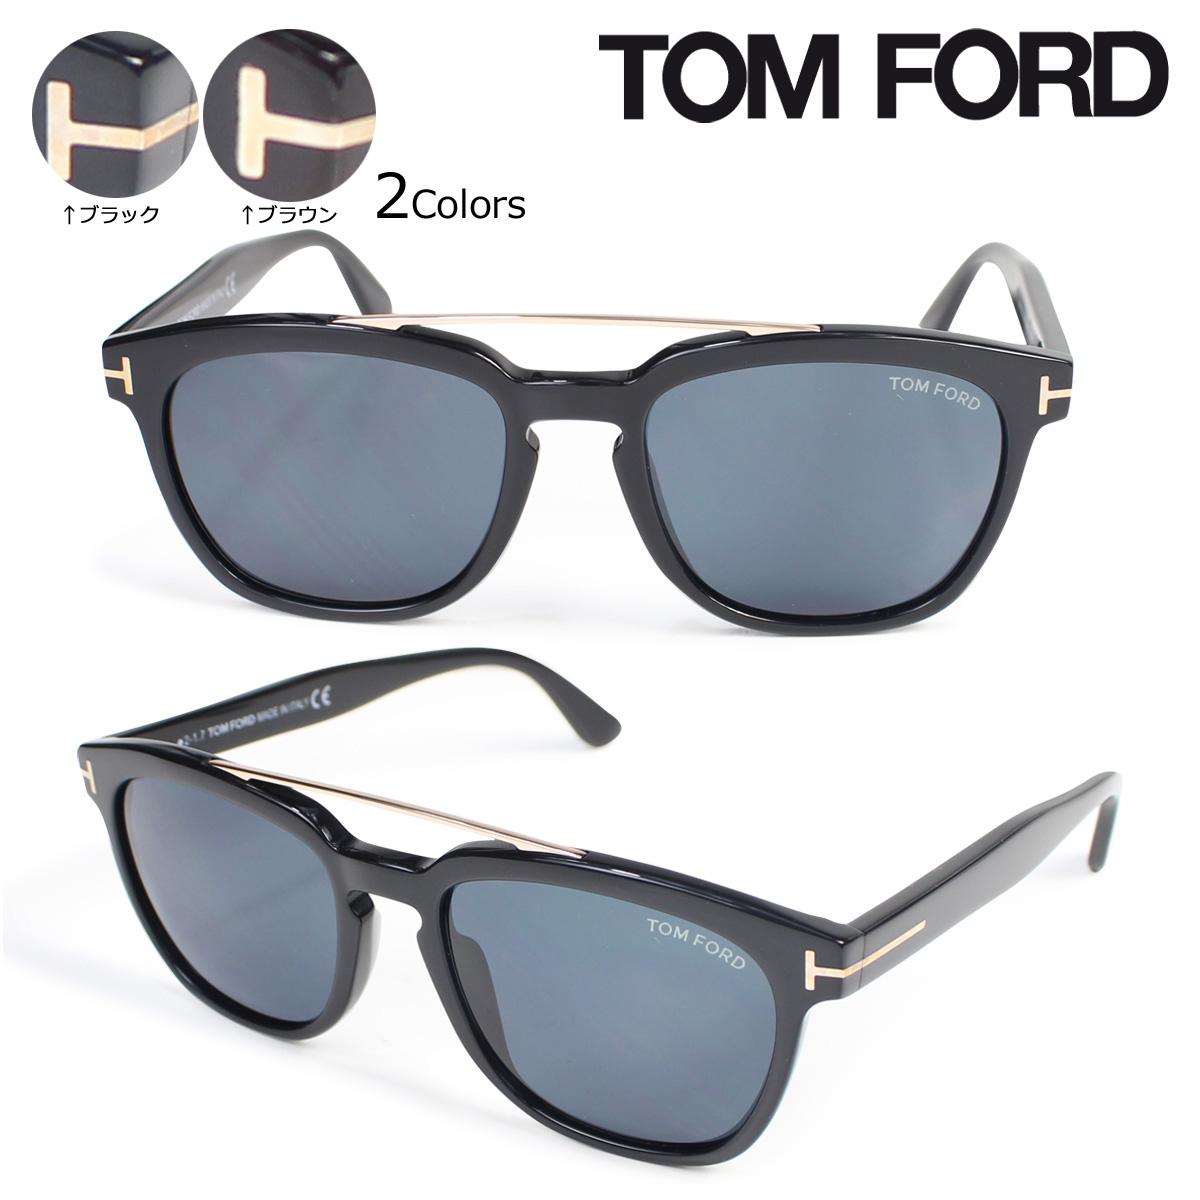 ad3e2742d47 ALLSPORTS  TOM FORD Tom Ford sunglasses glasses men gap Dis eyewear ...